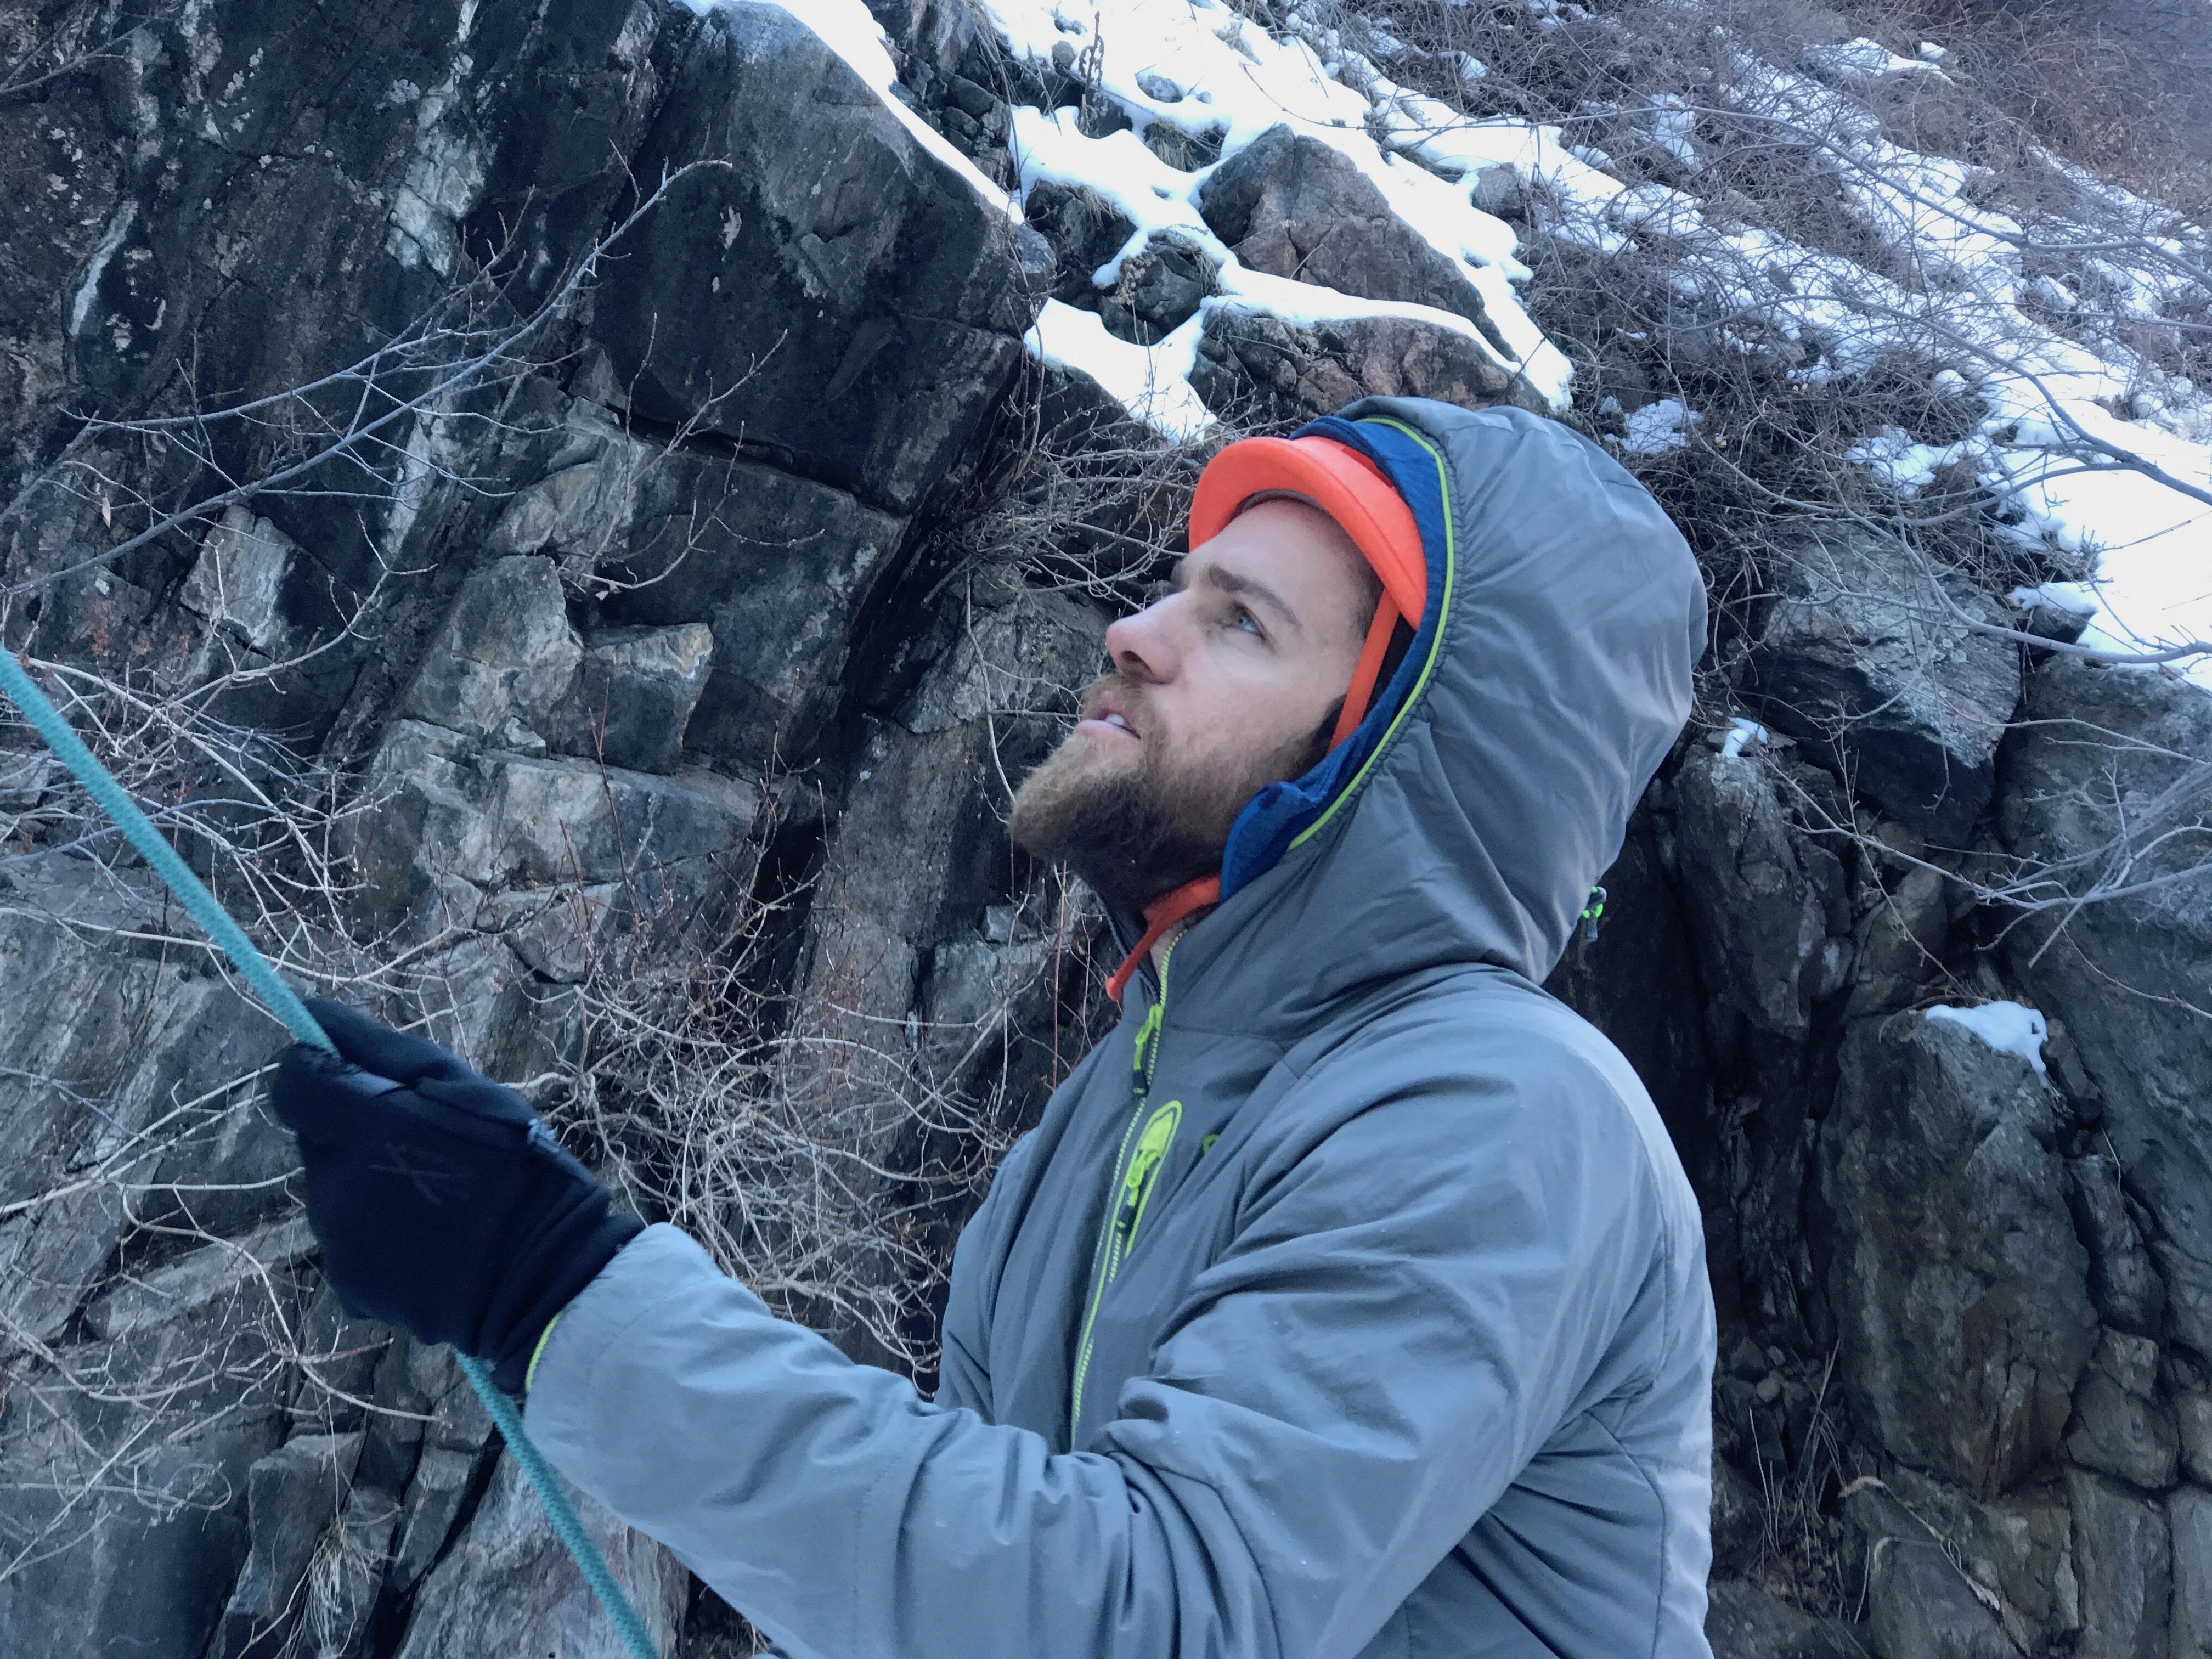 Scott Yorko on belay duty in Clear Creek Canyon, Colorado. [Photo] Chris Van Leuven